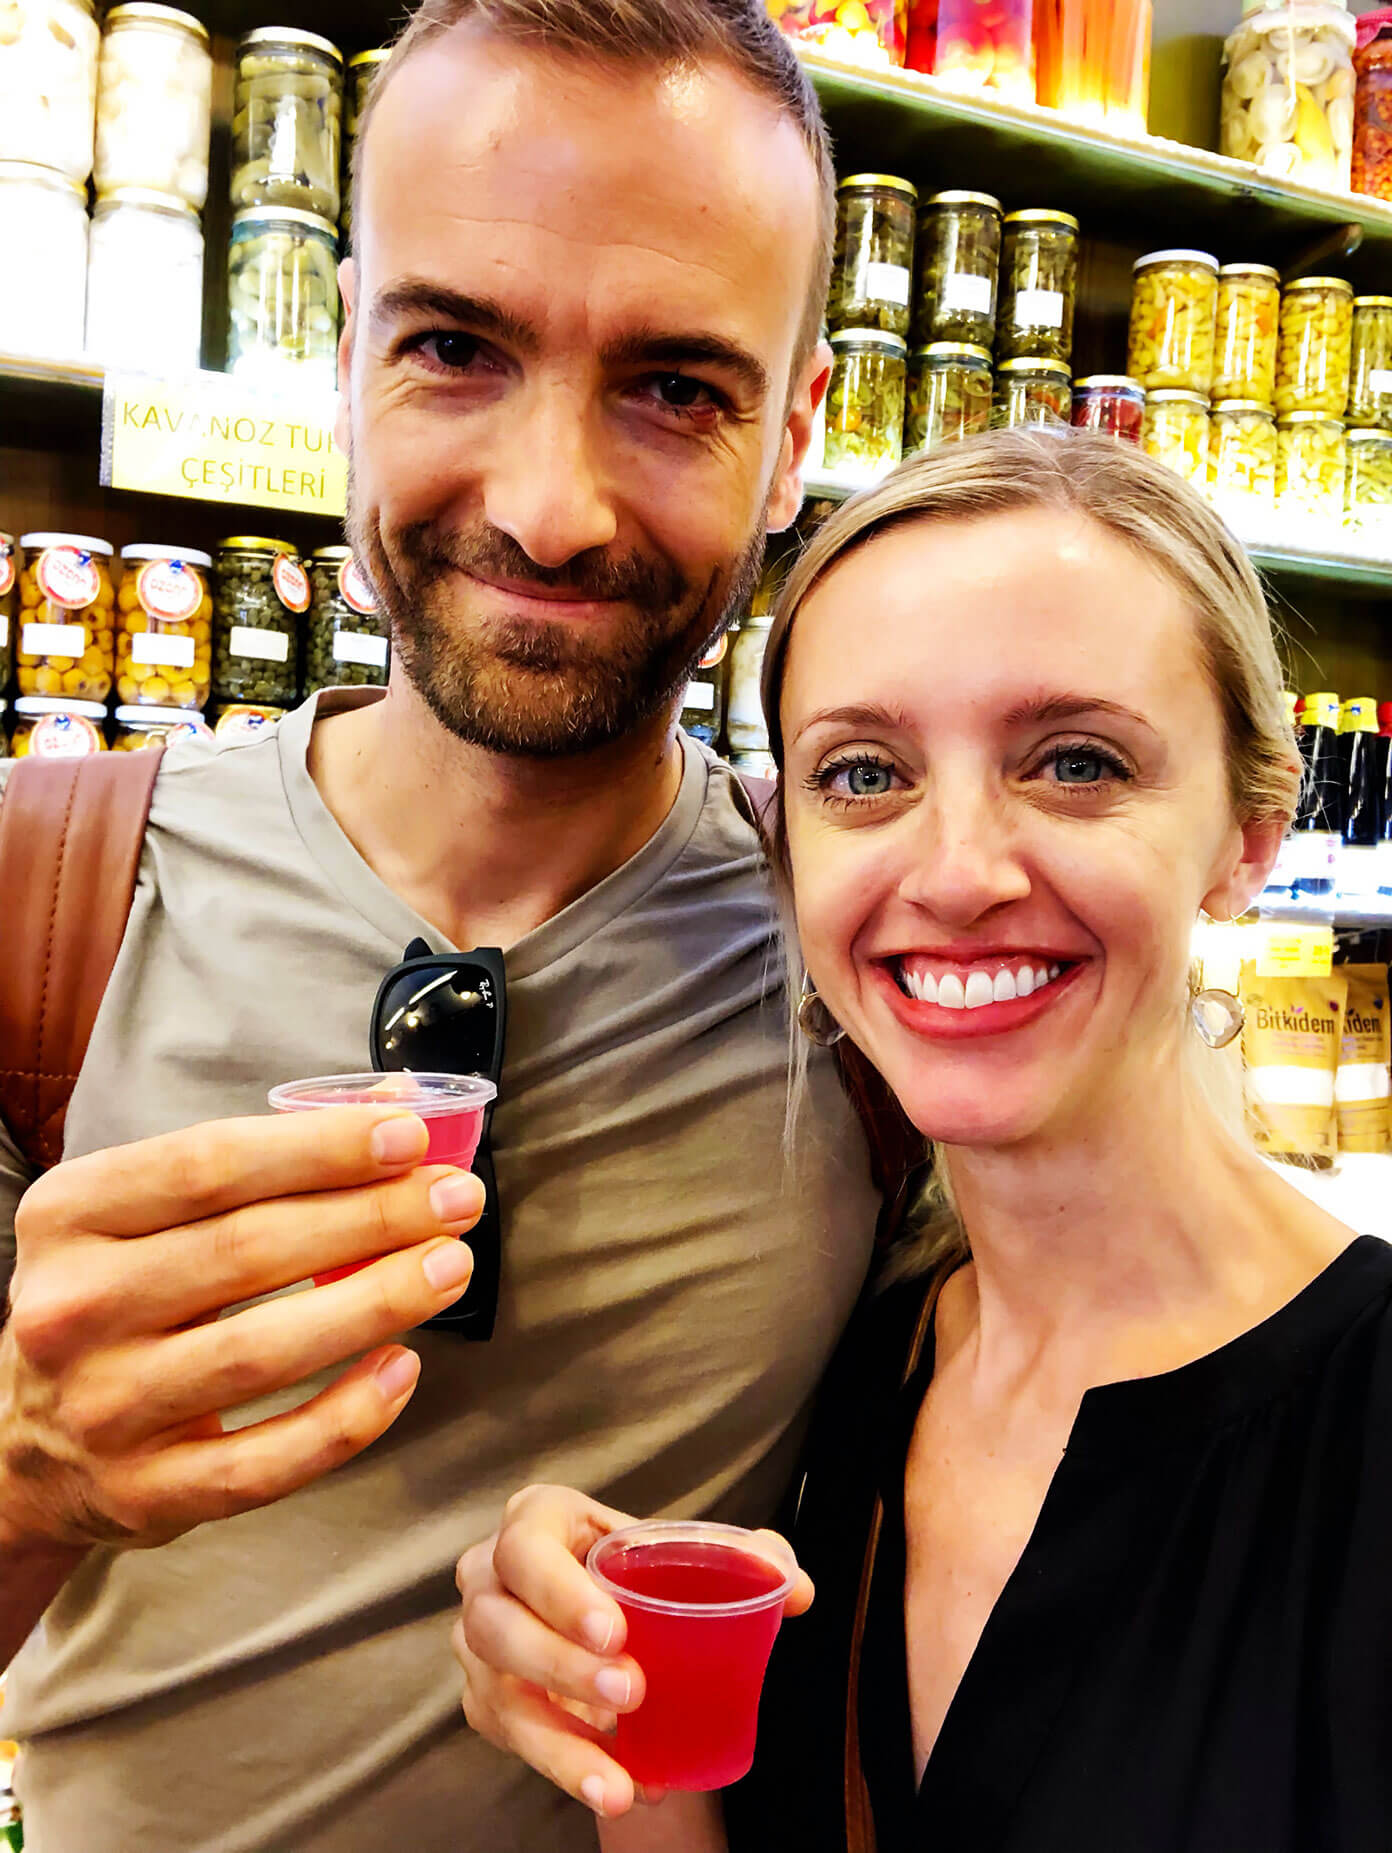 Pickle juice Istanbul